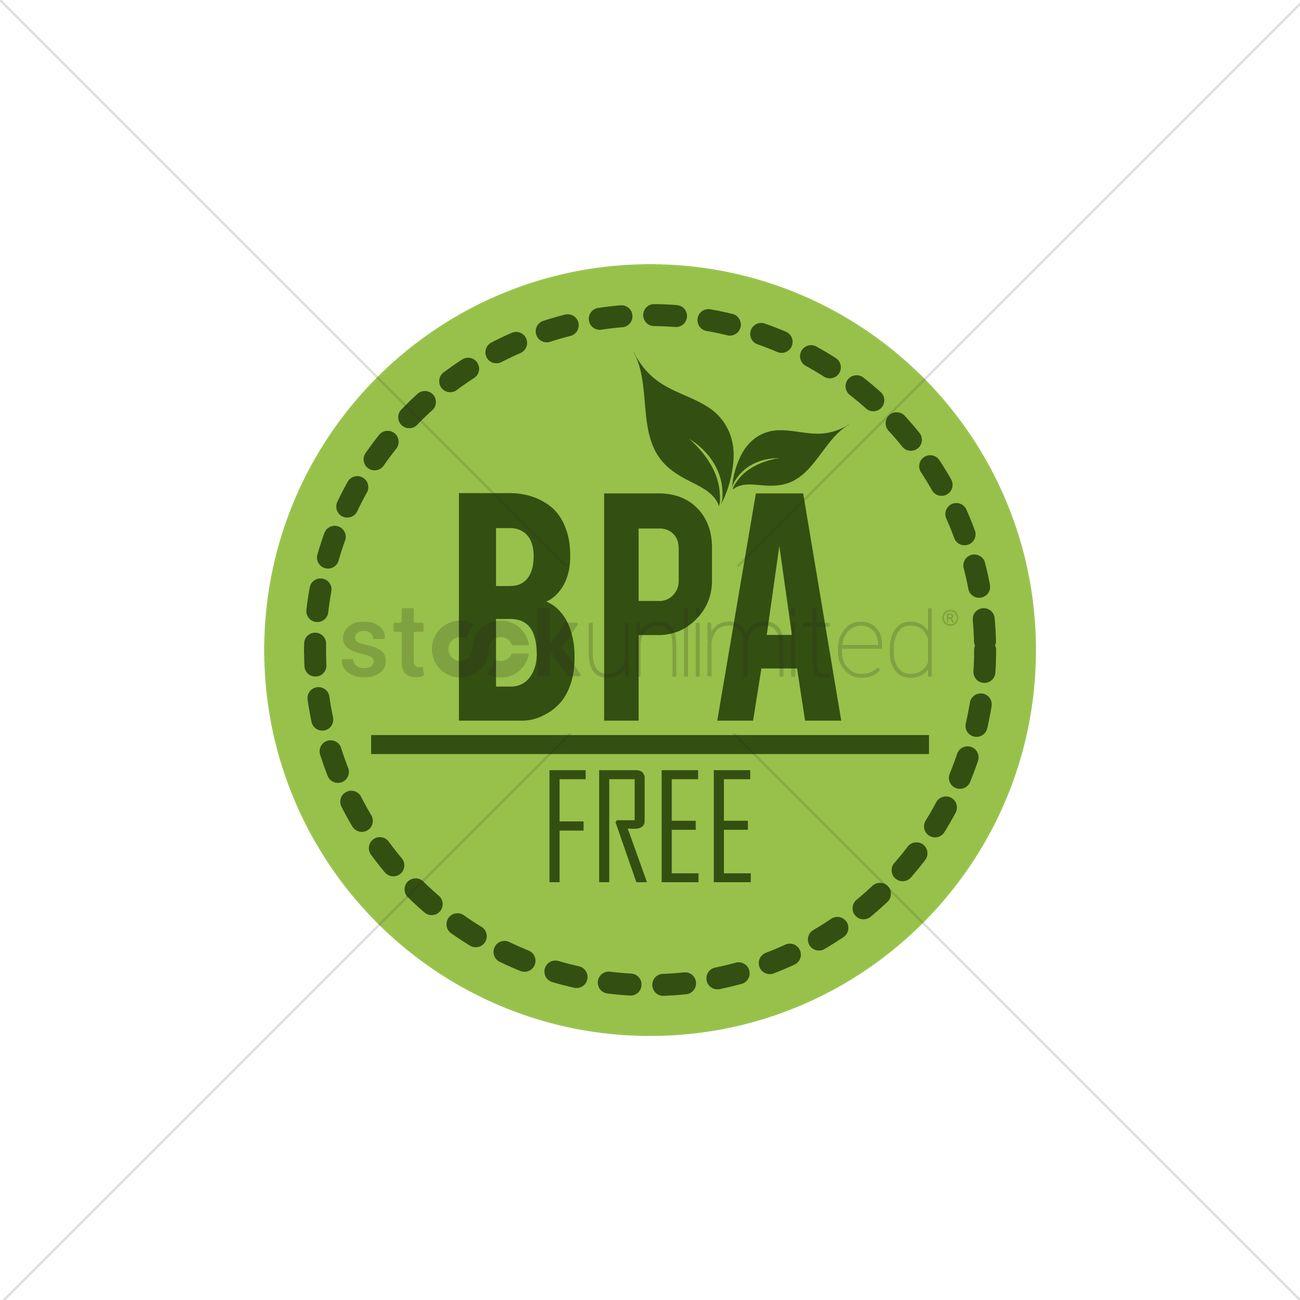 Bpa free label Vector Image.